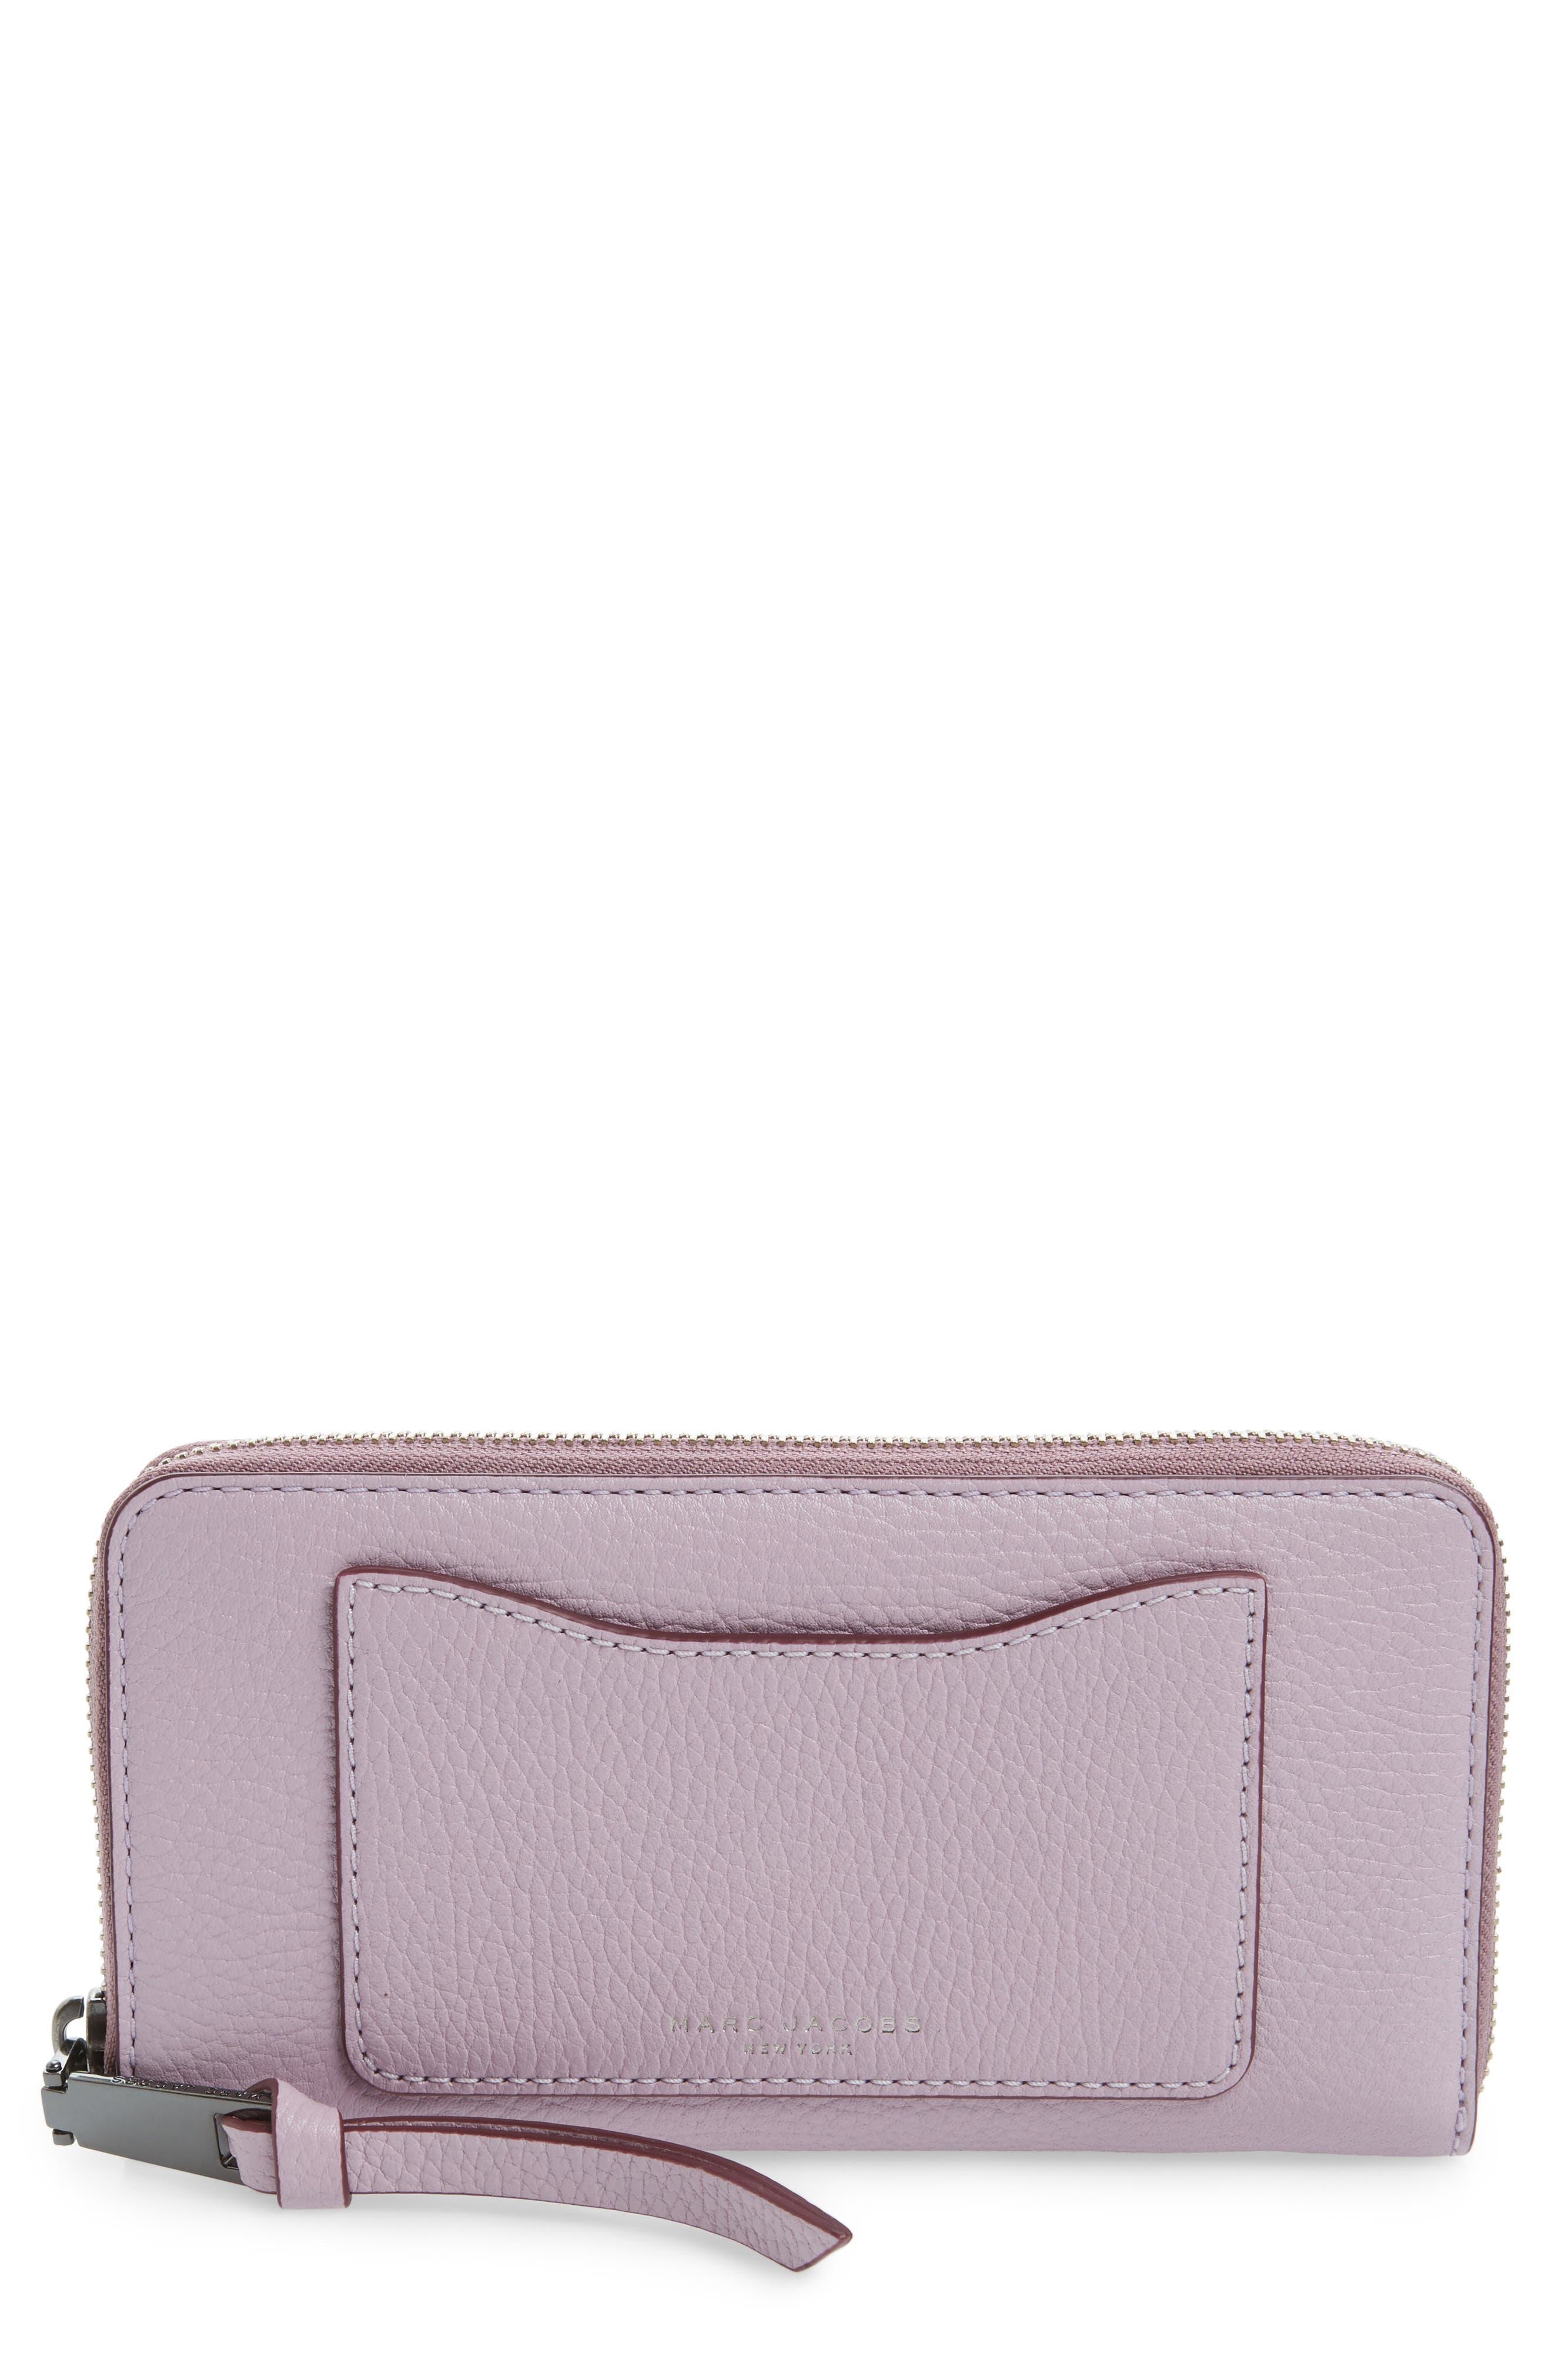 'Recruit Vertical' Leather Wallet,                             Main thumbnail 1, color,                             500